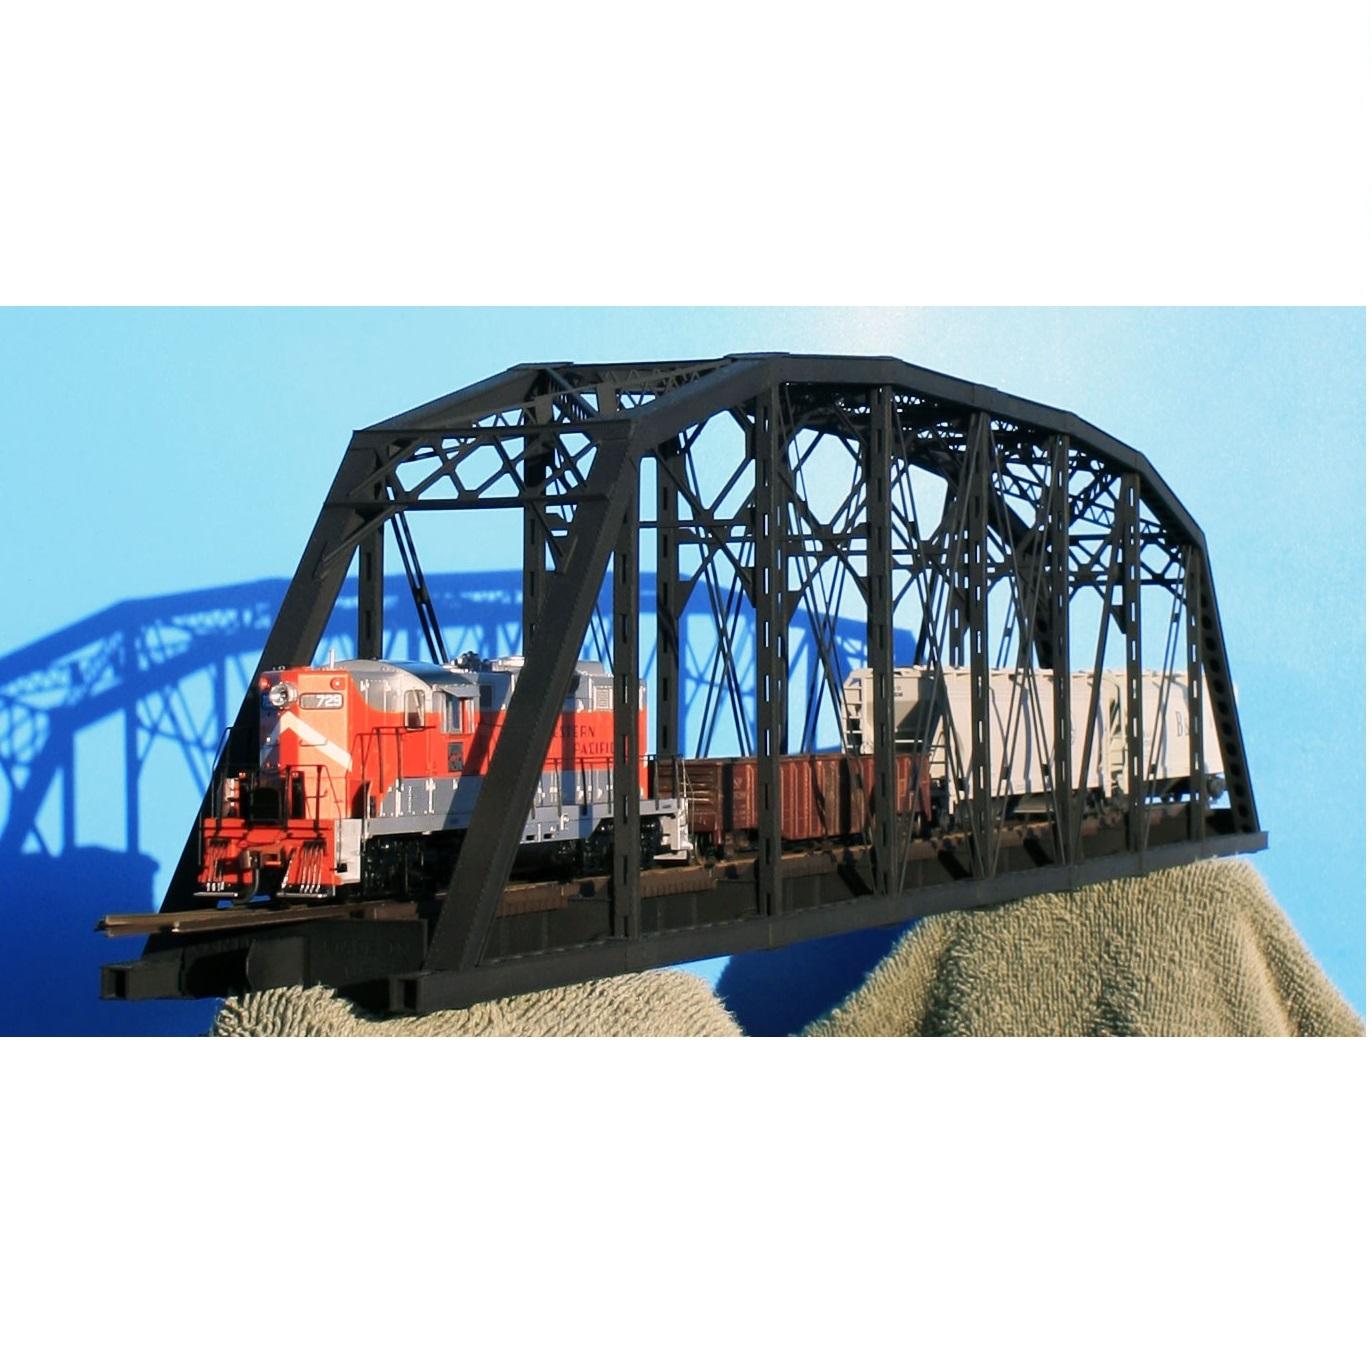 central valley model works 200 parker truss bridge kit ho scale